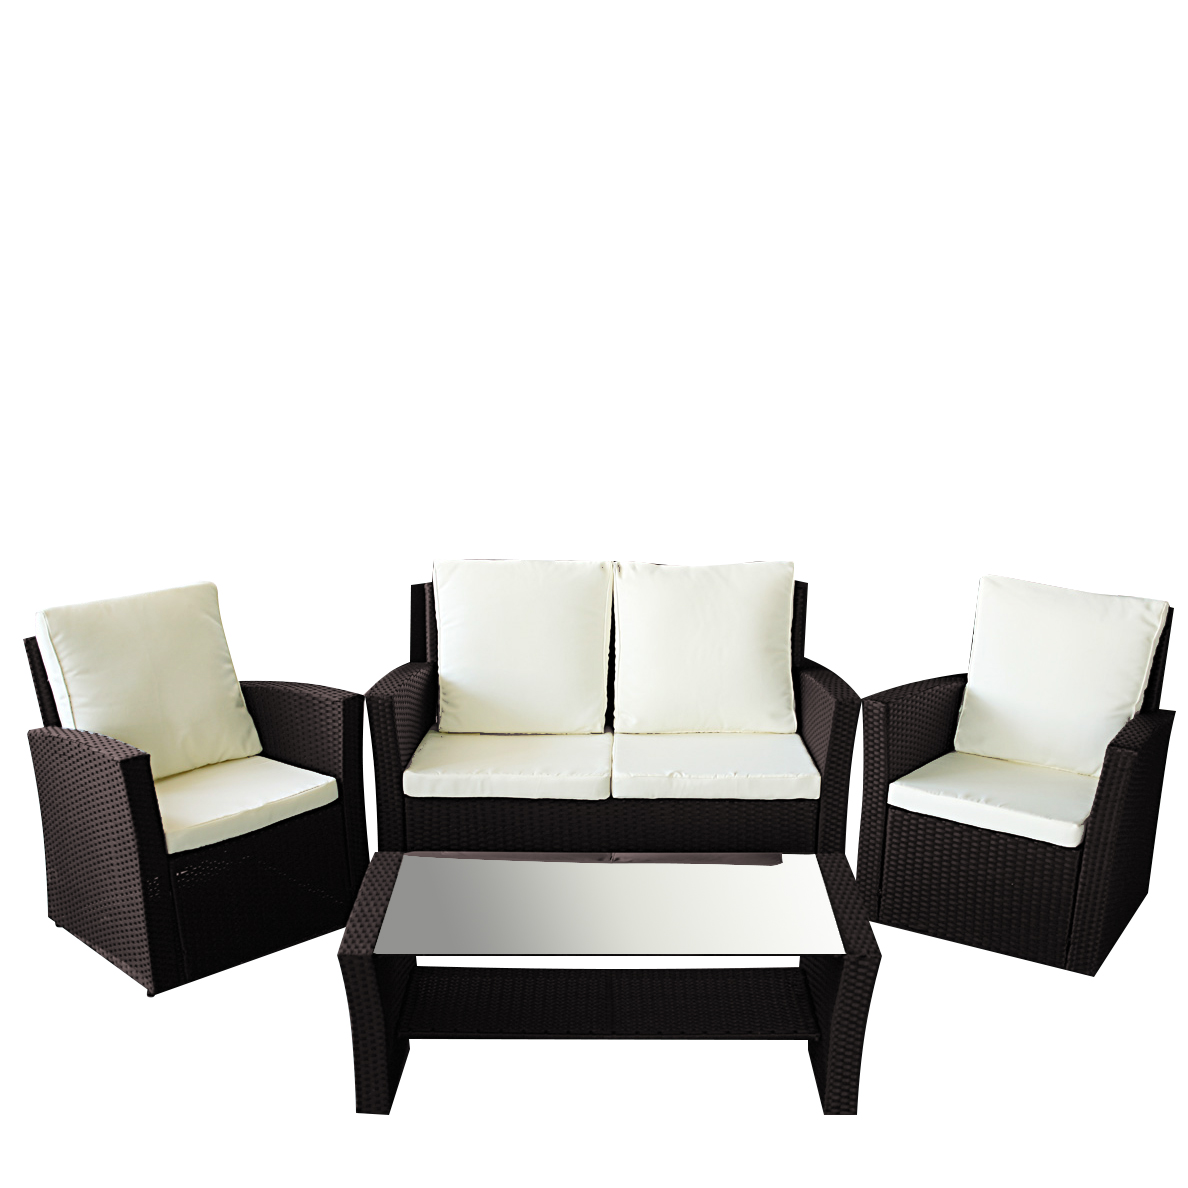 gartenm bel polyrattan sitzgruppe garten lounge le havre braun ebay. Black Bedroom Furniture Sets. Home Design Ideas